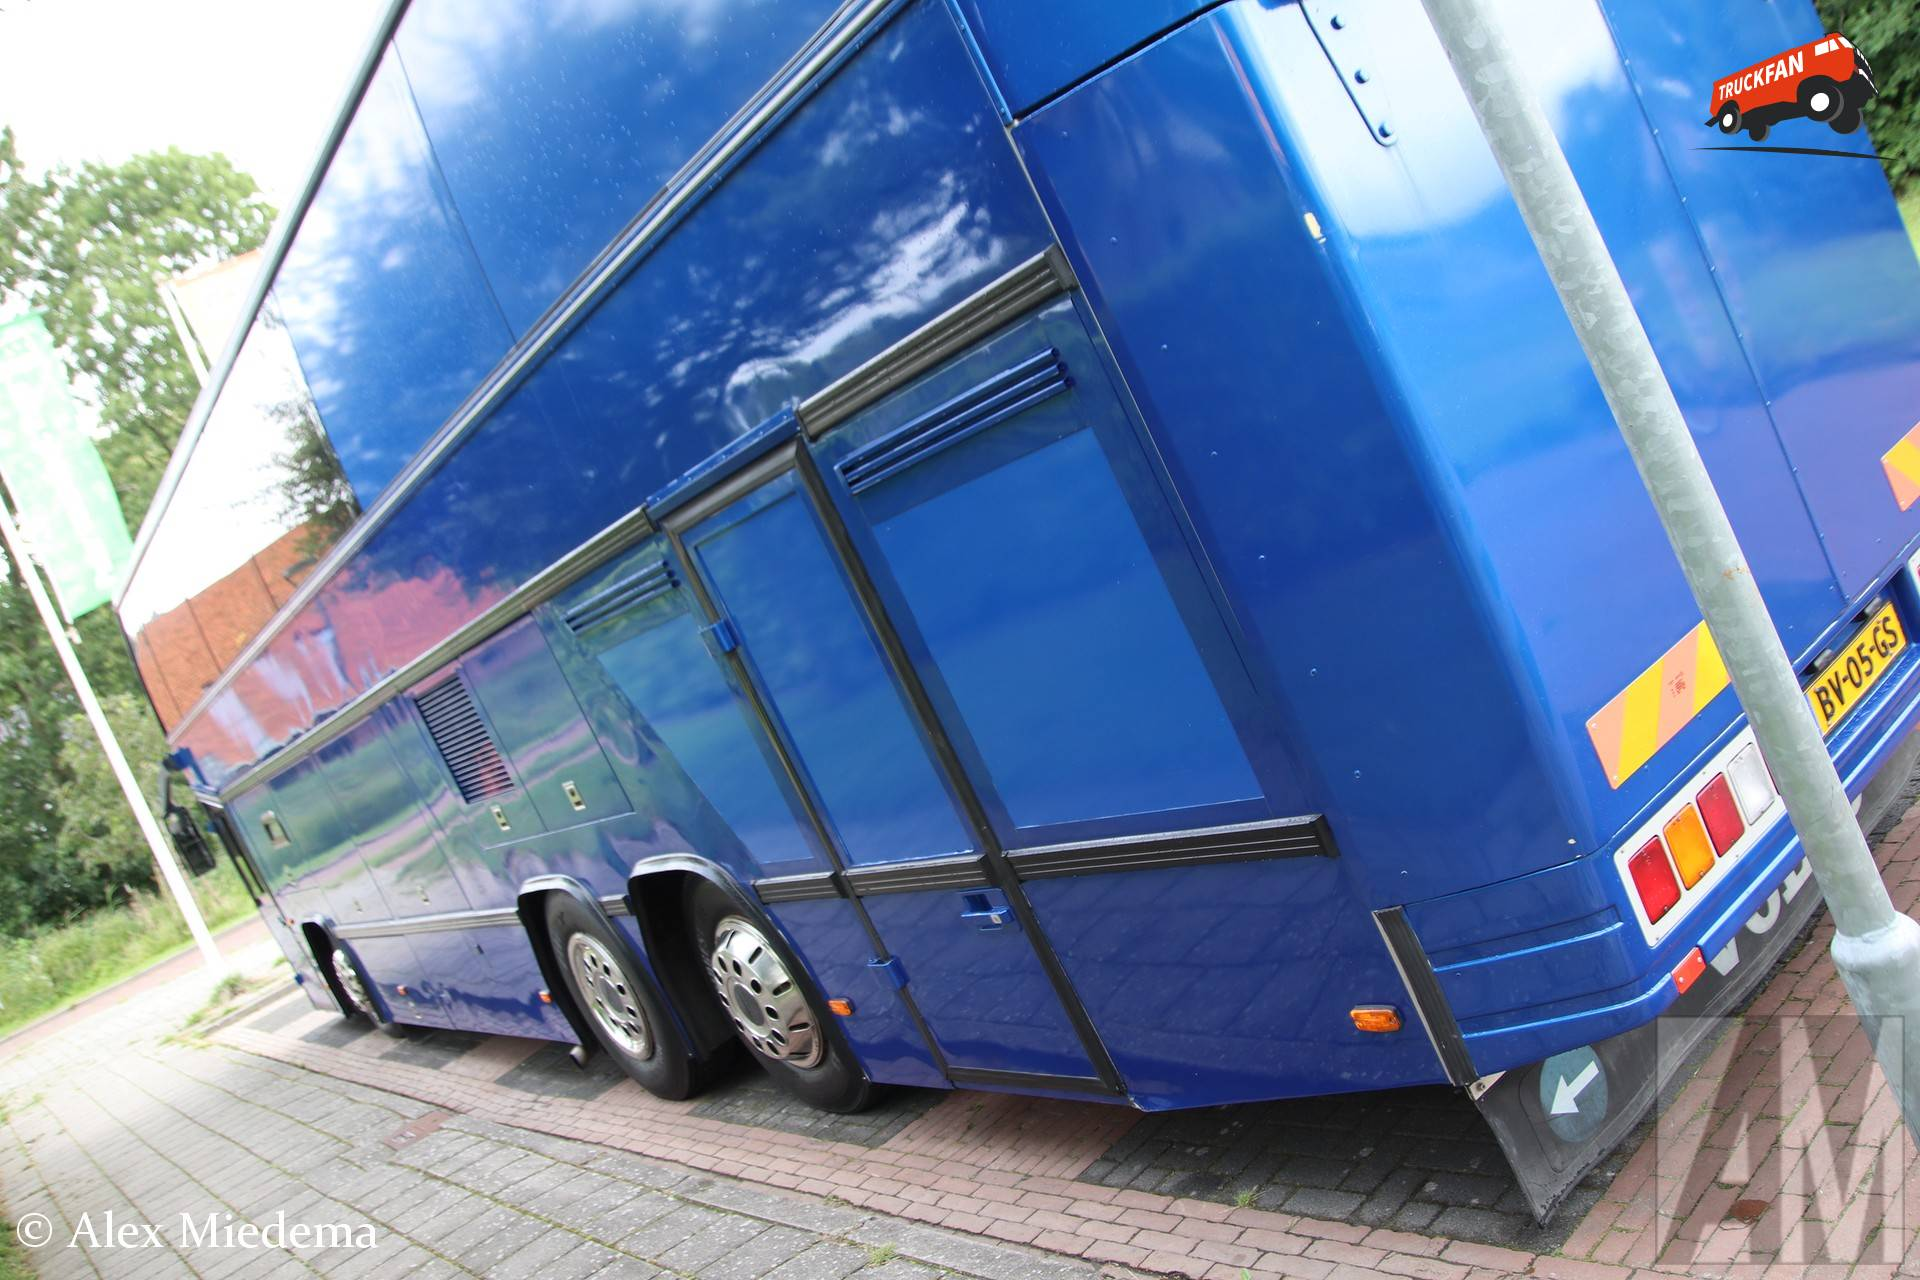 Jonckheere touringcar